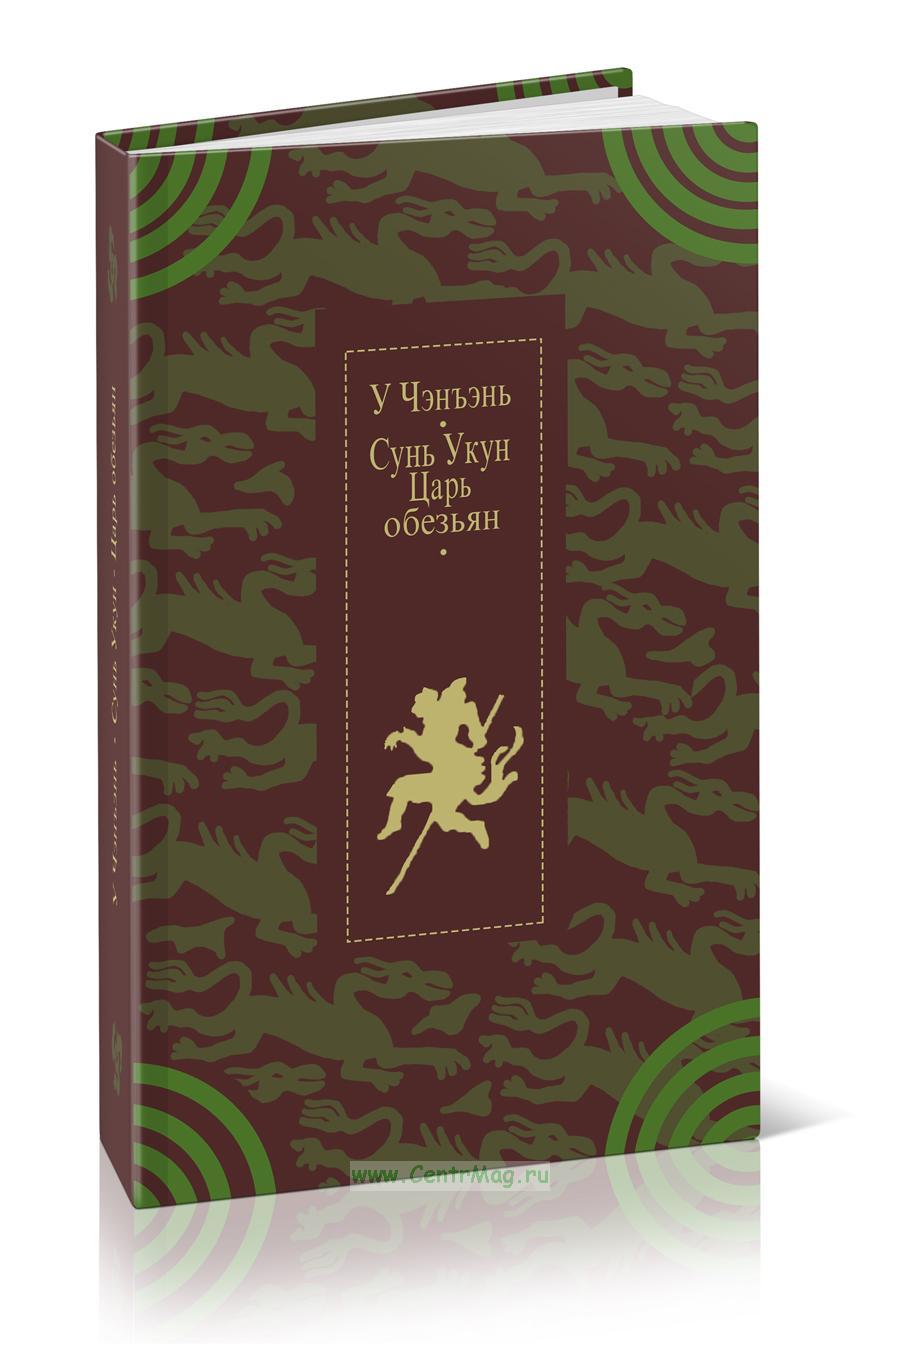 Сунь Укун — царь обезьян: роман